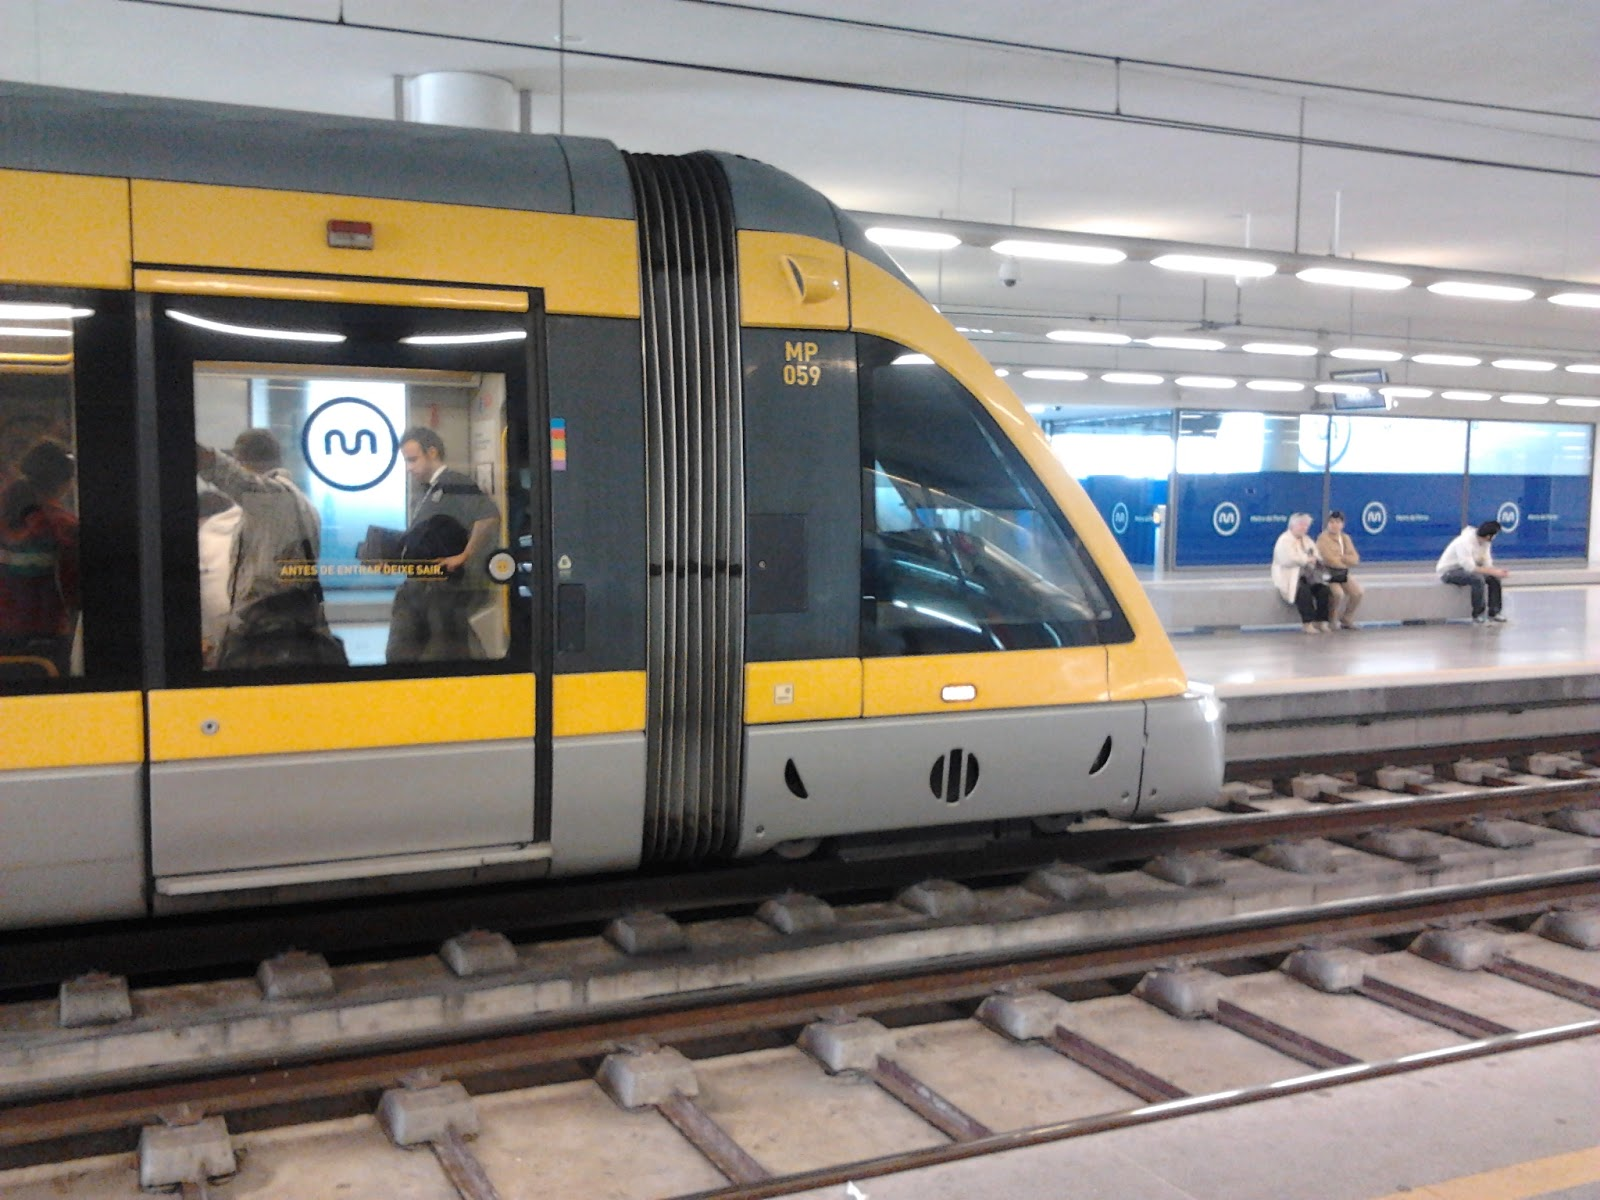 Barraqueiro vence o concurso da Metro do Porto